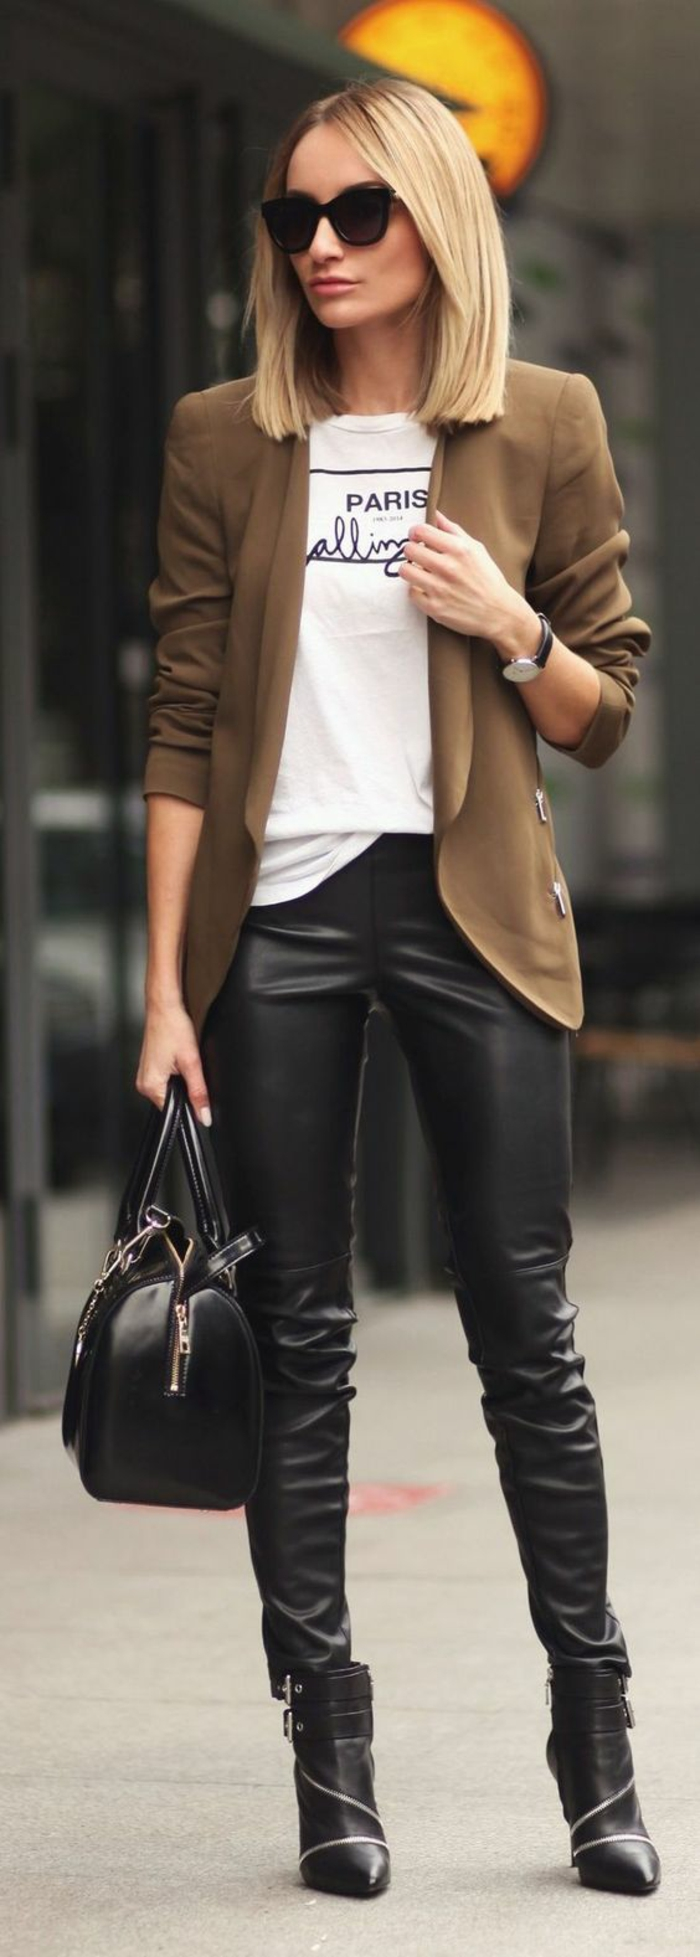 veste-kaki-legging-cuir-femme-blouse-imprimée